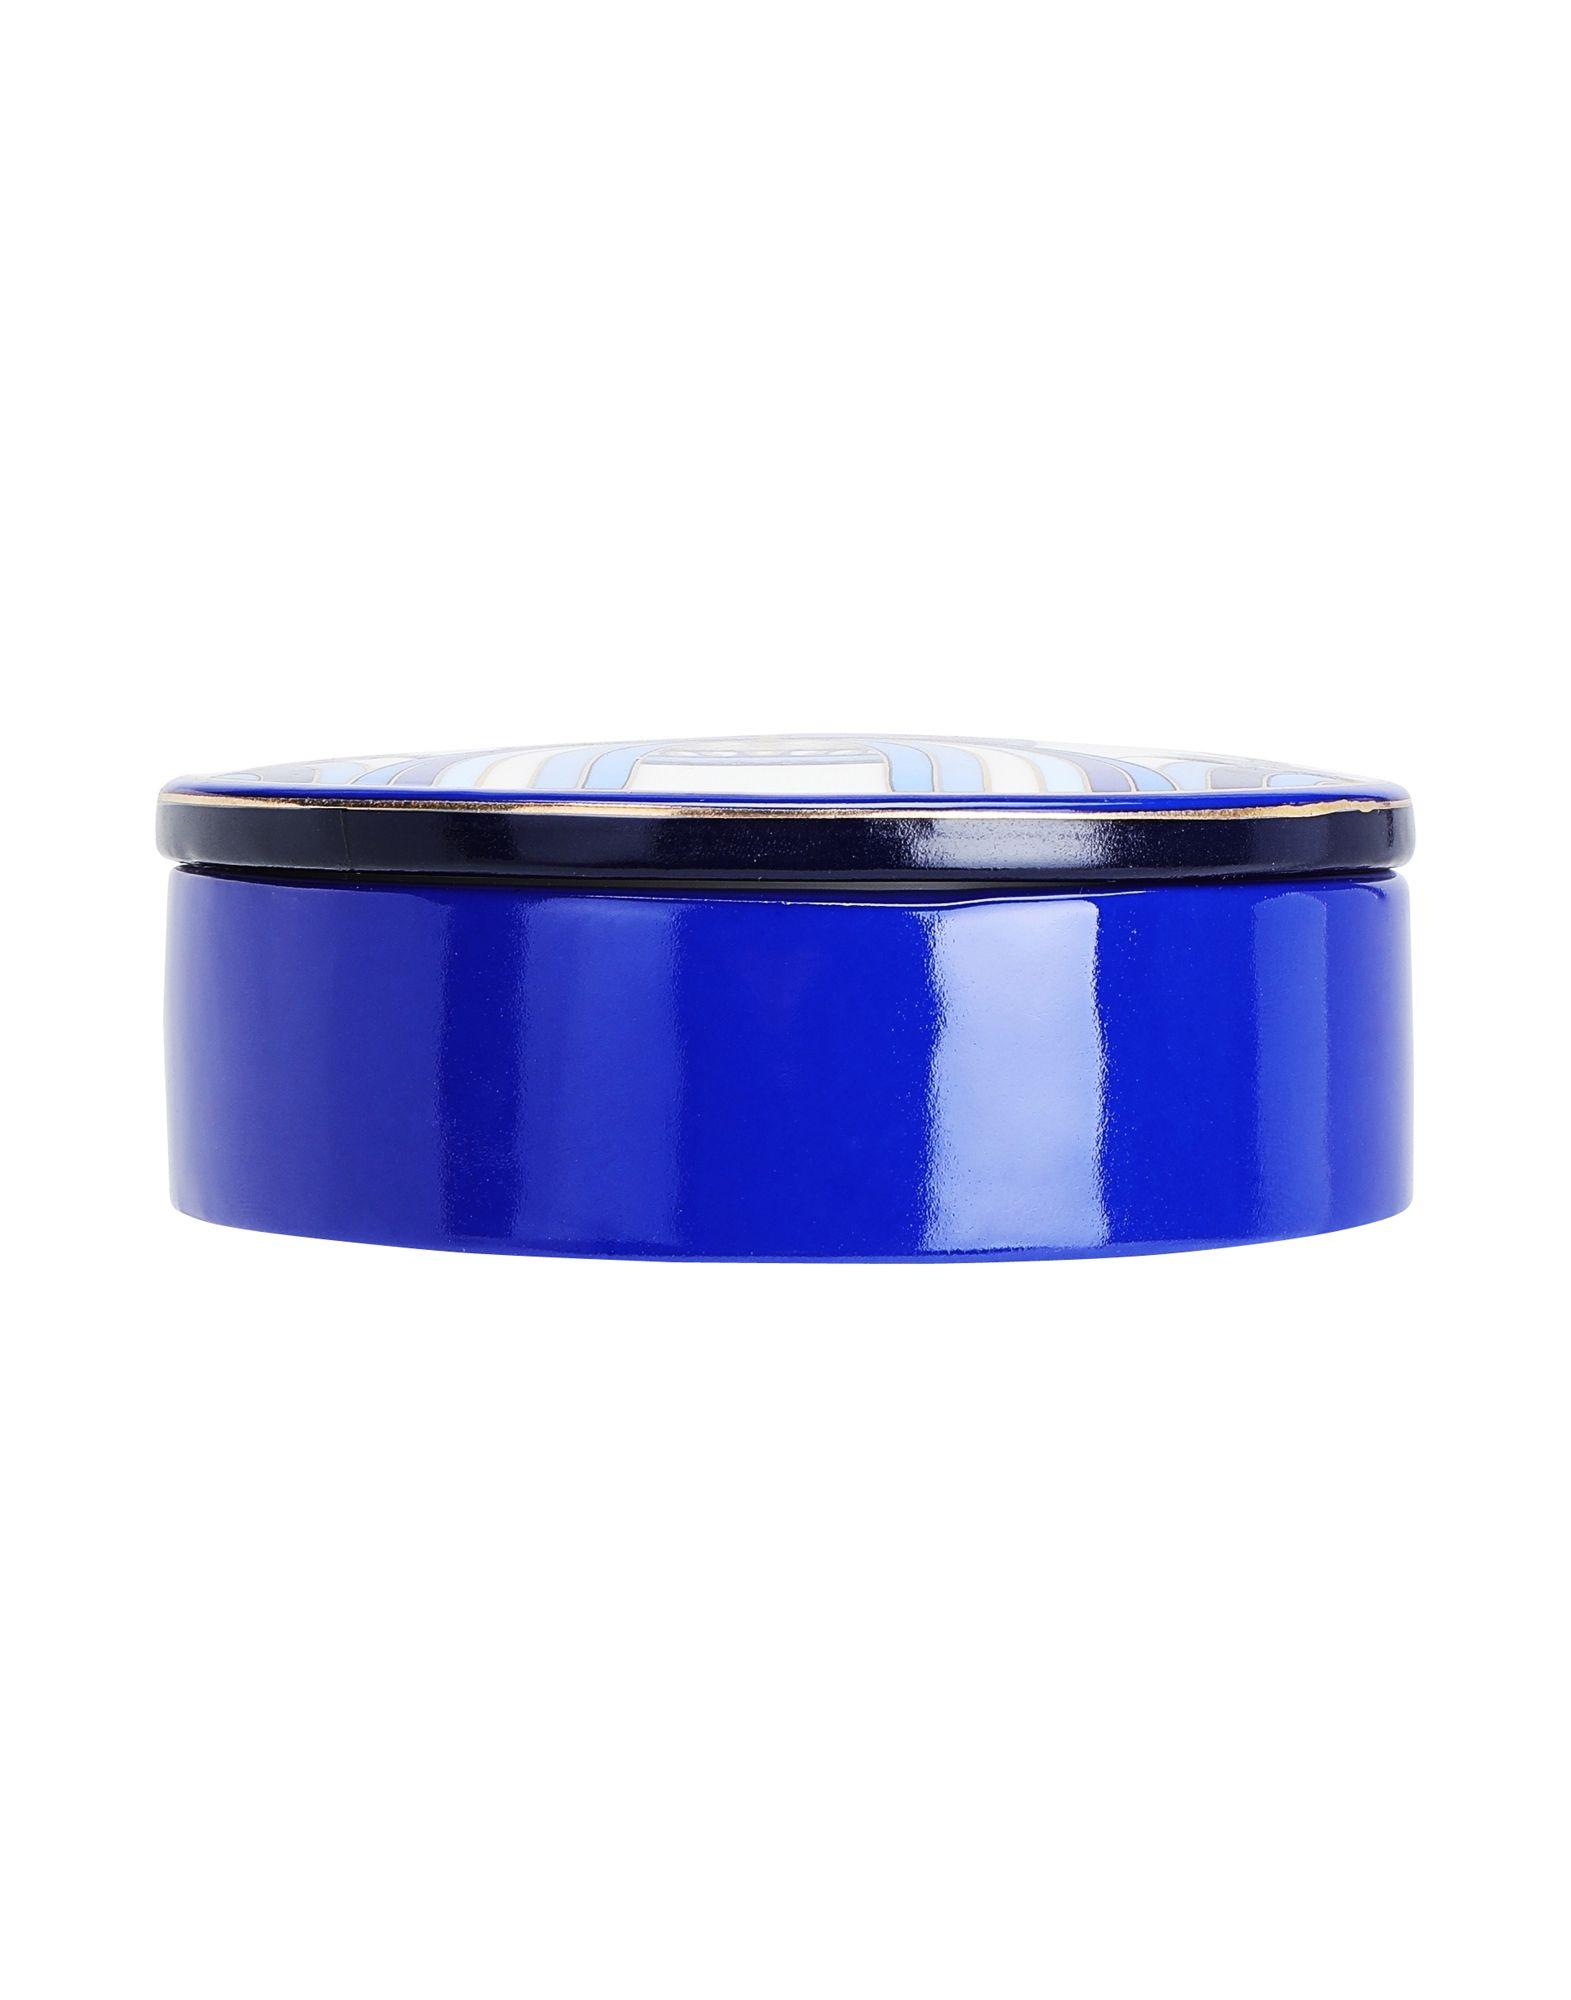 YOOX.COM(ユークス)《セール開催中》JONATHAN ADLER Unisex 雑貨 ブルー セラミック